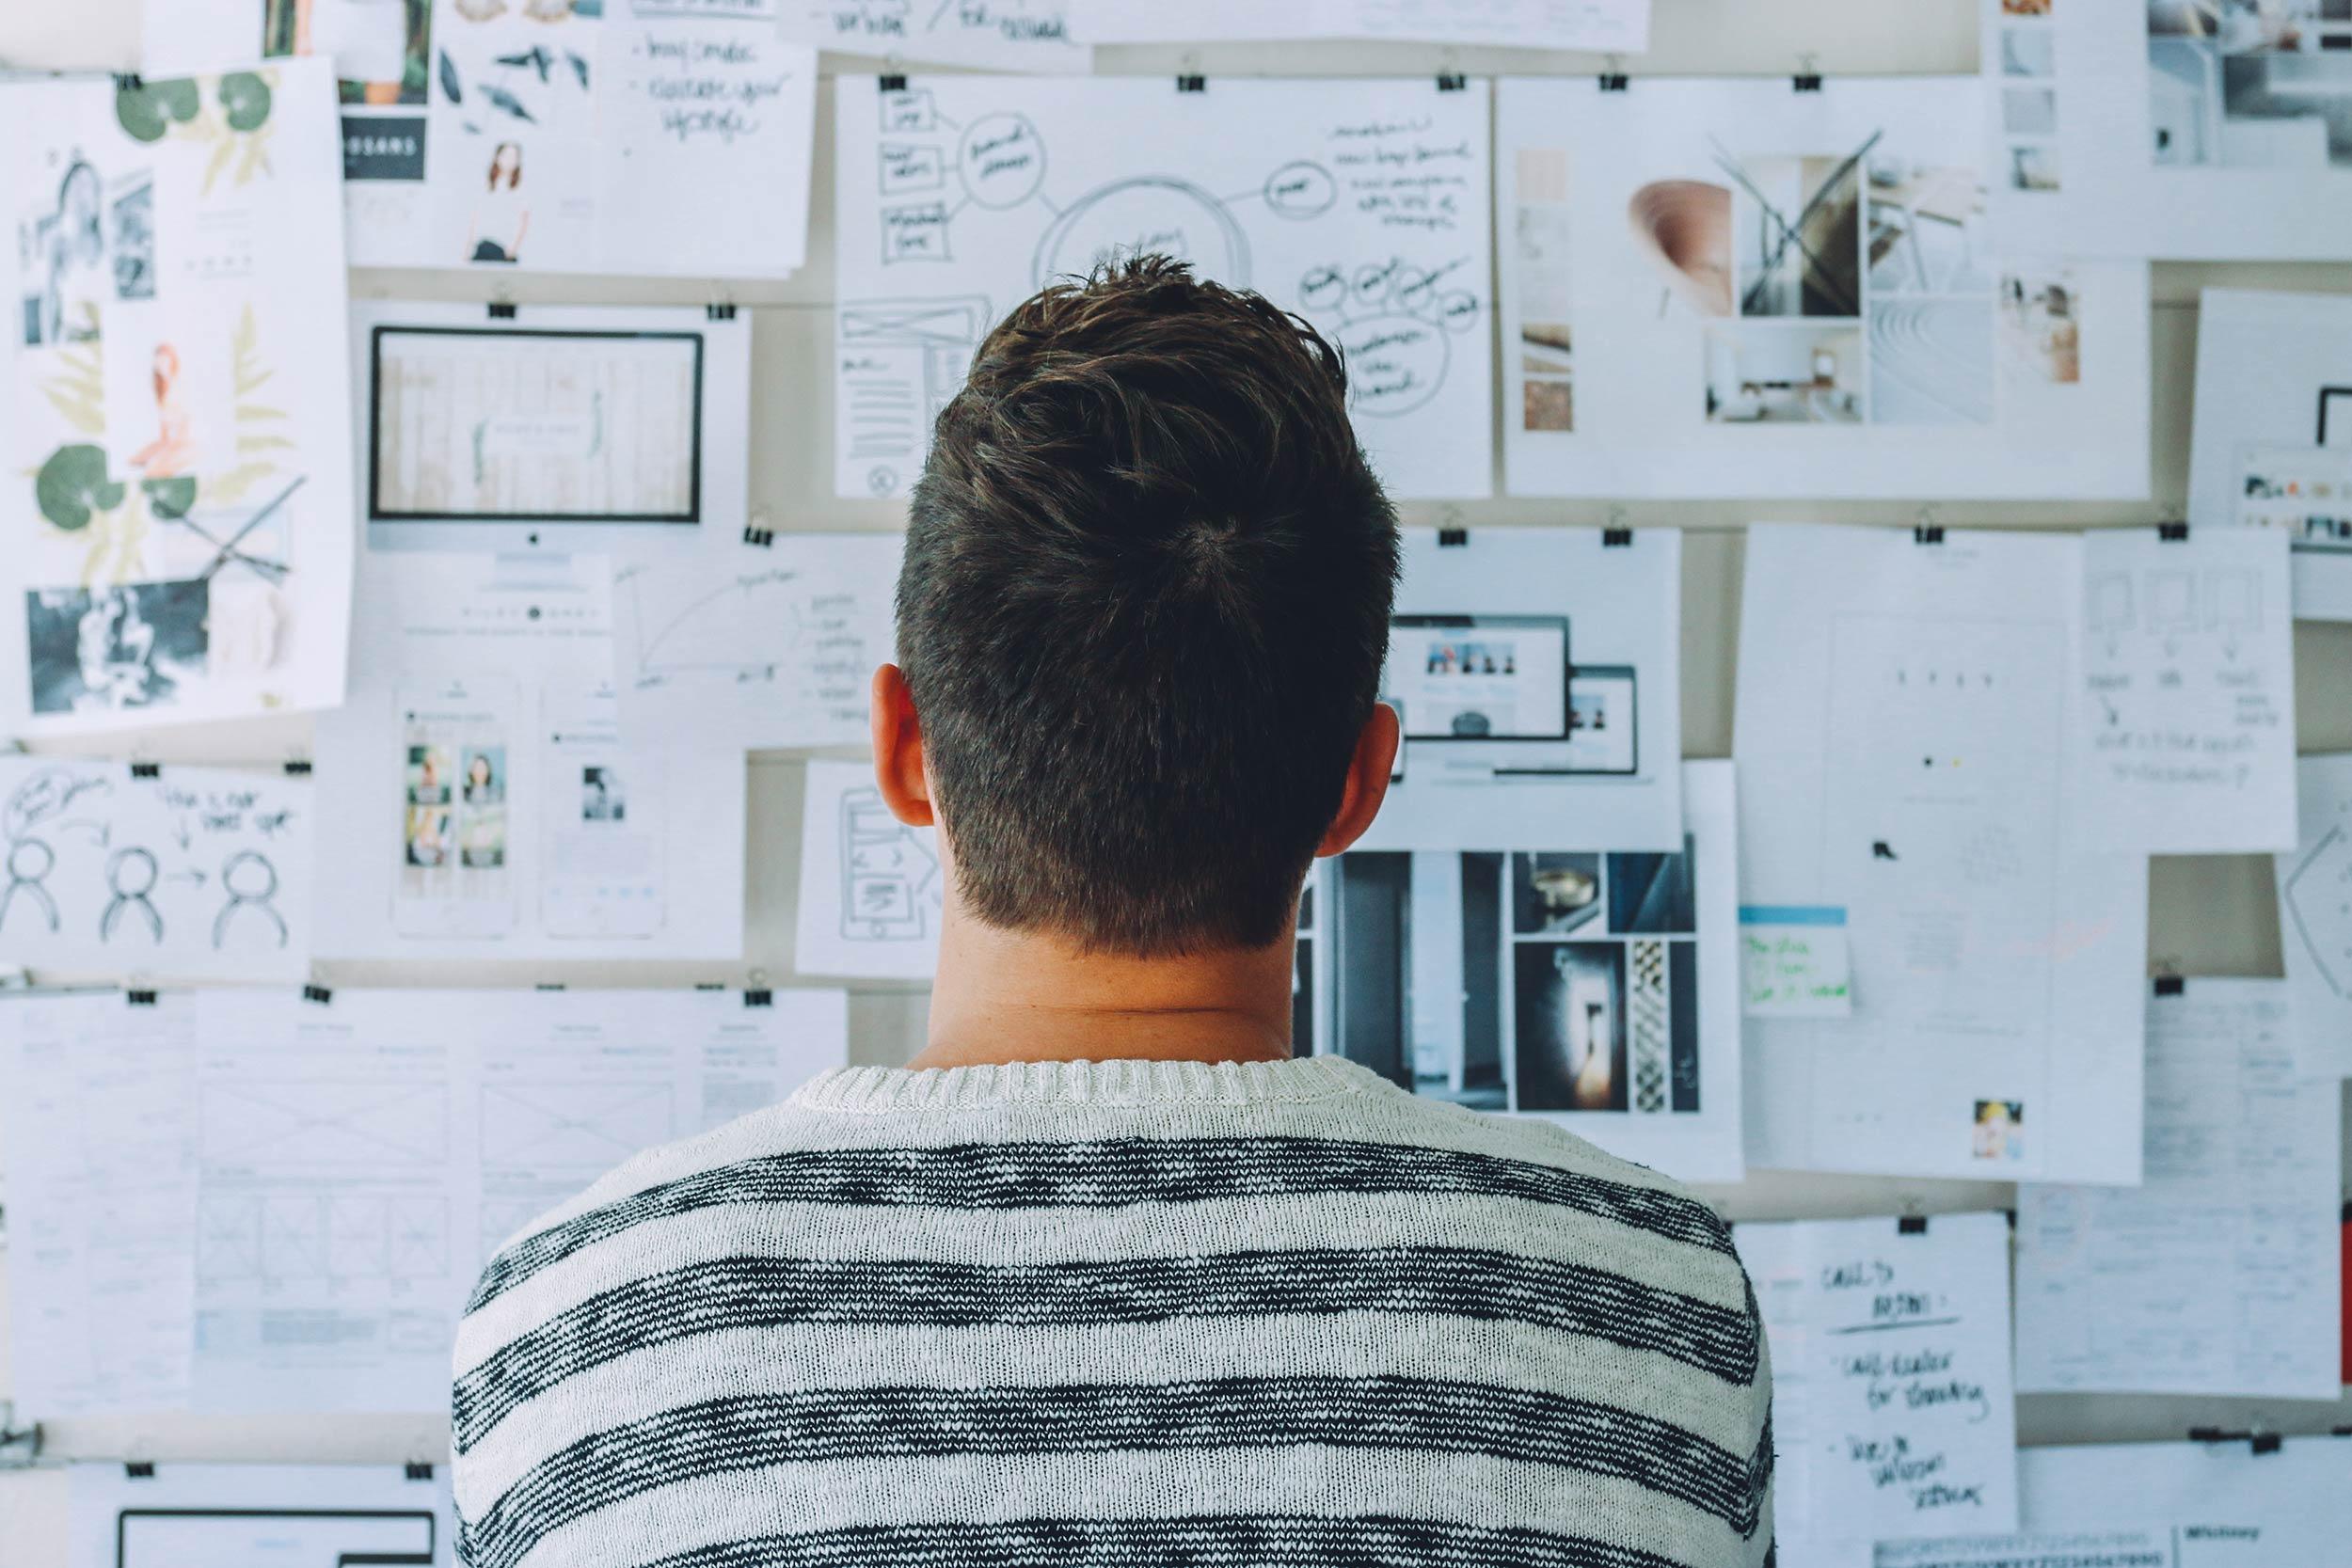 A man staring at pin ups pondering what to do next